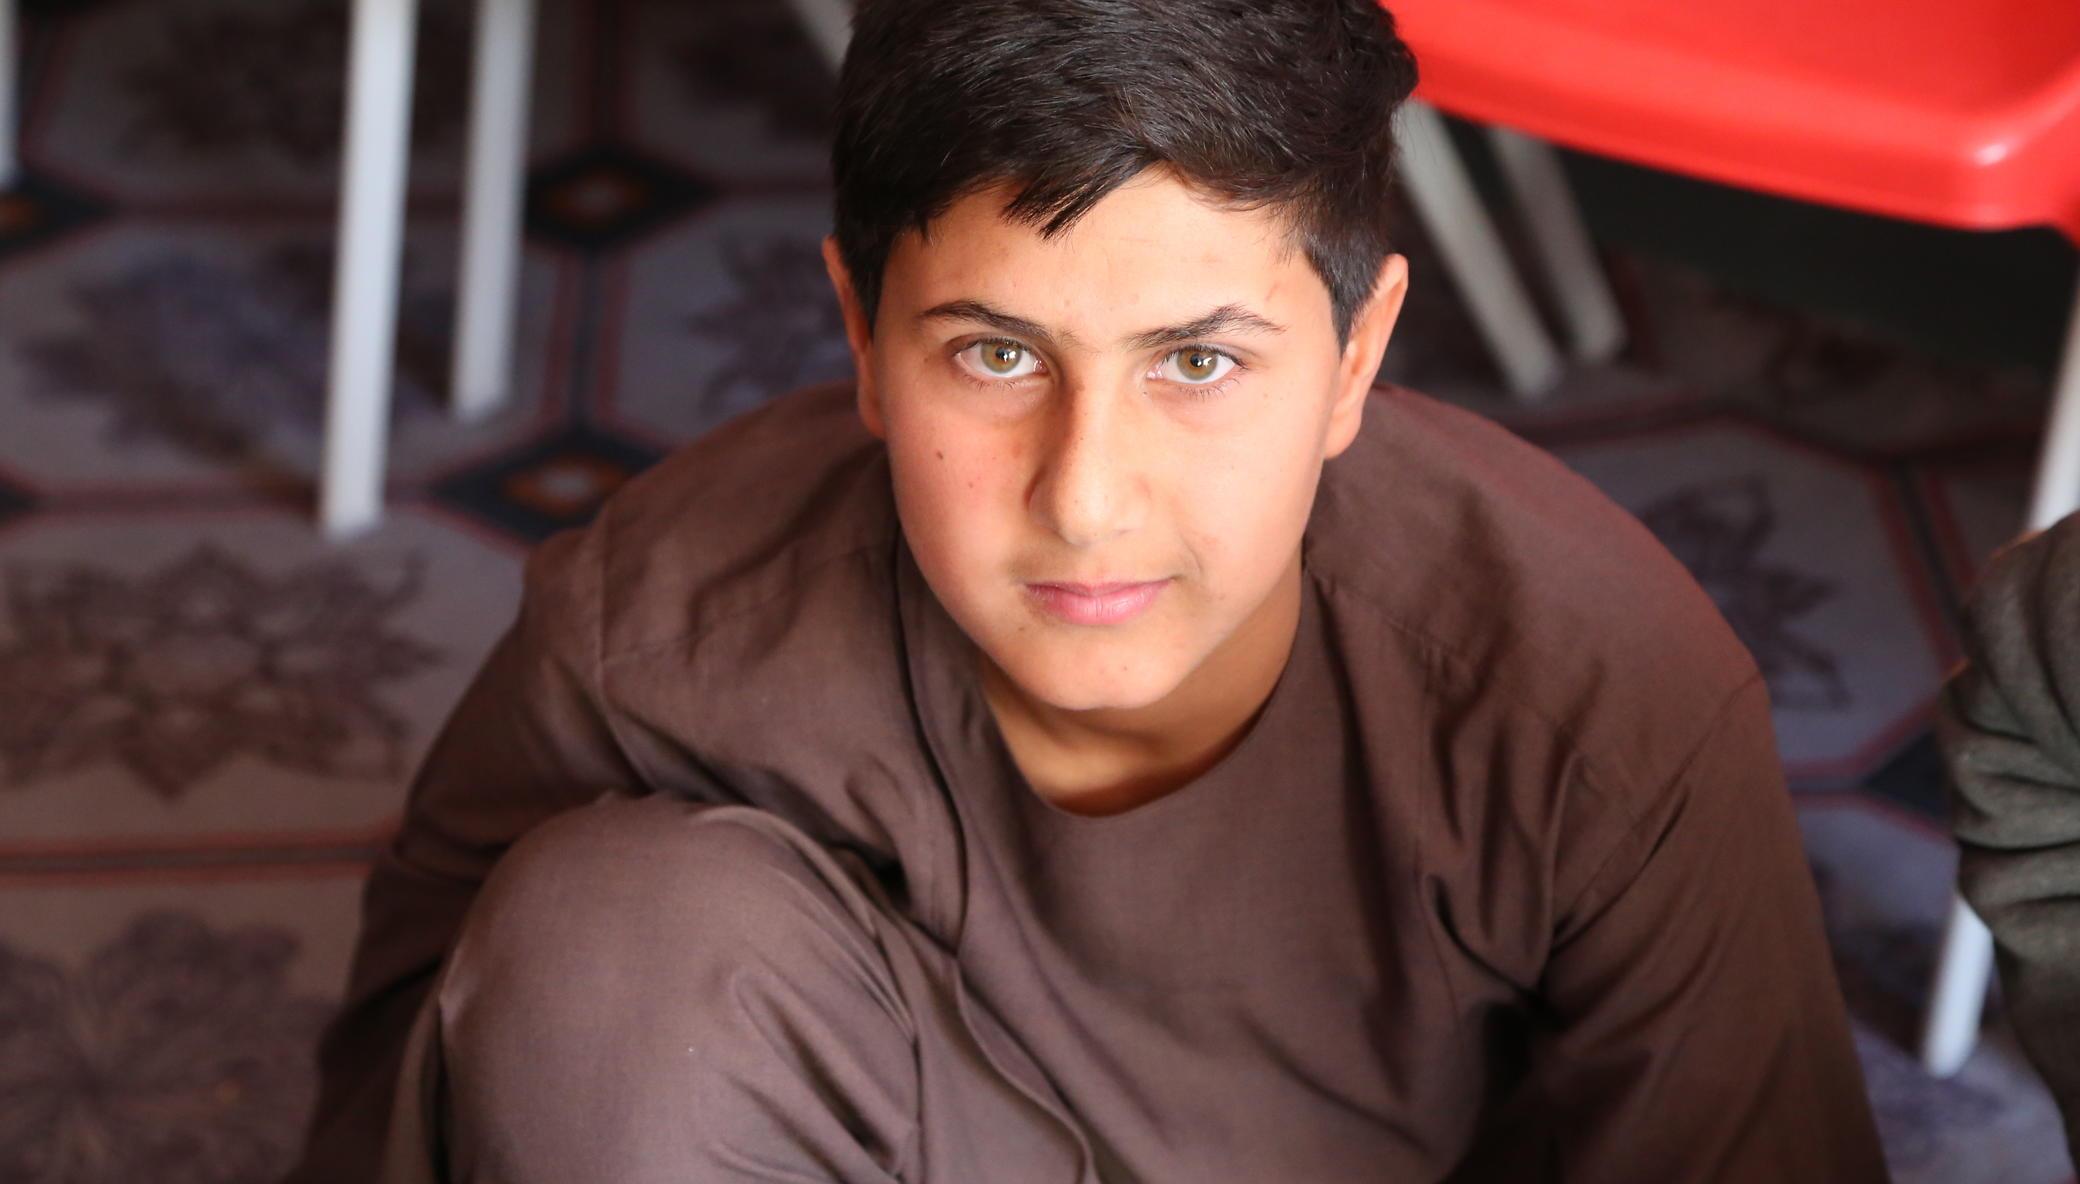 Engage Afghan Men and Boys as Gender Allies